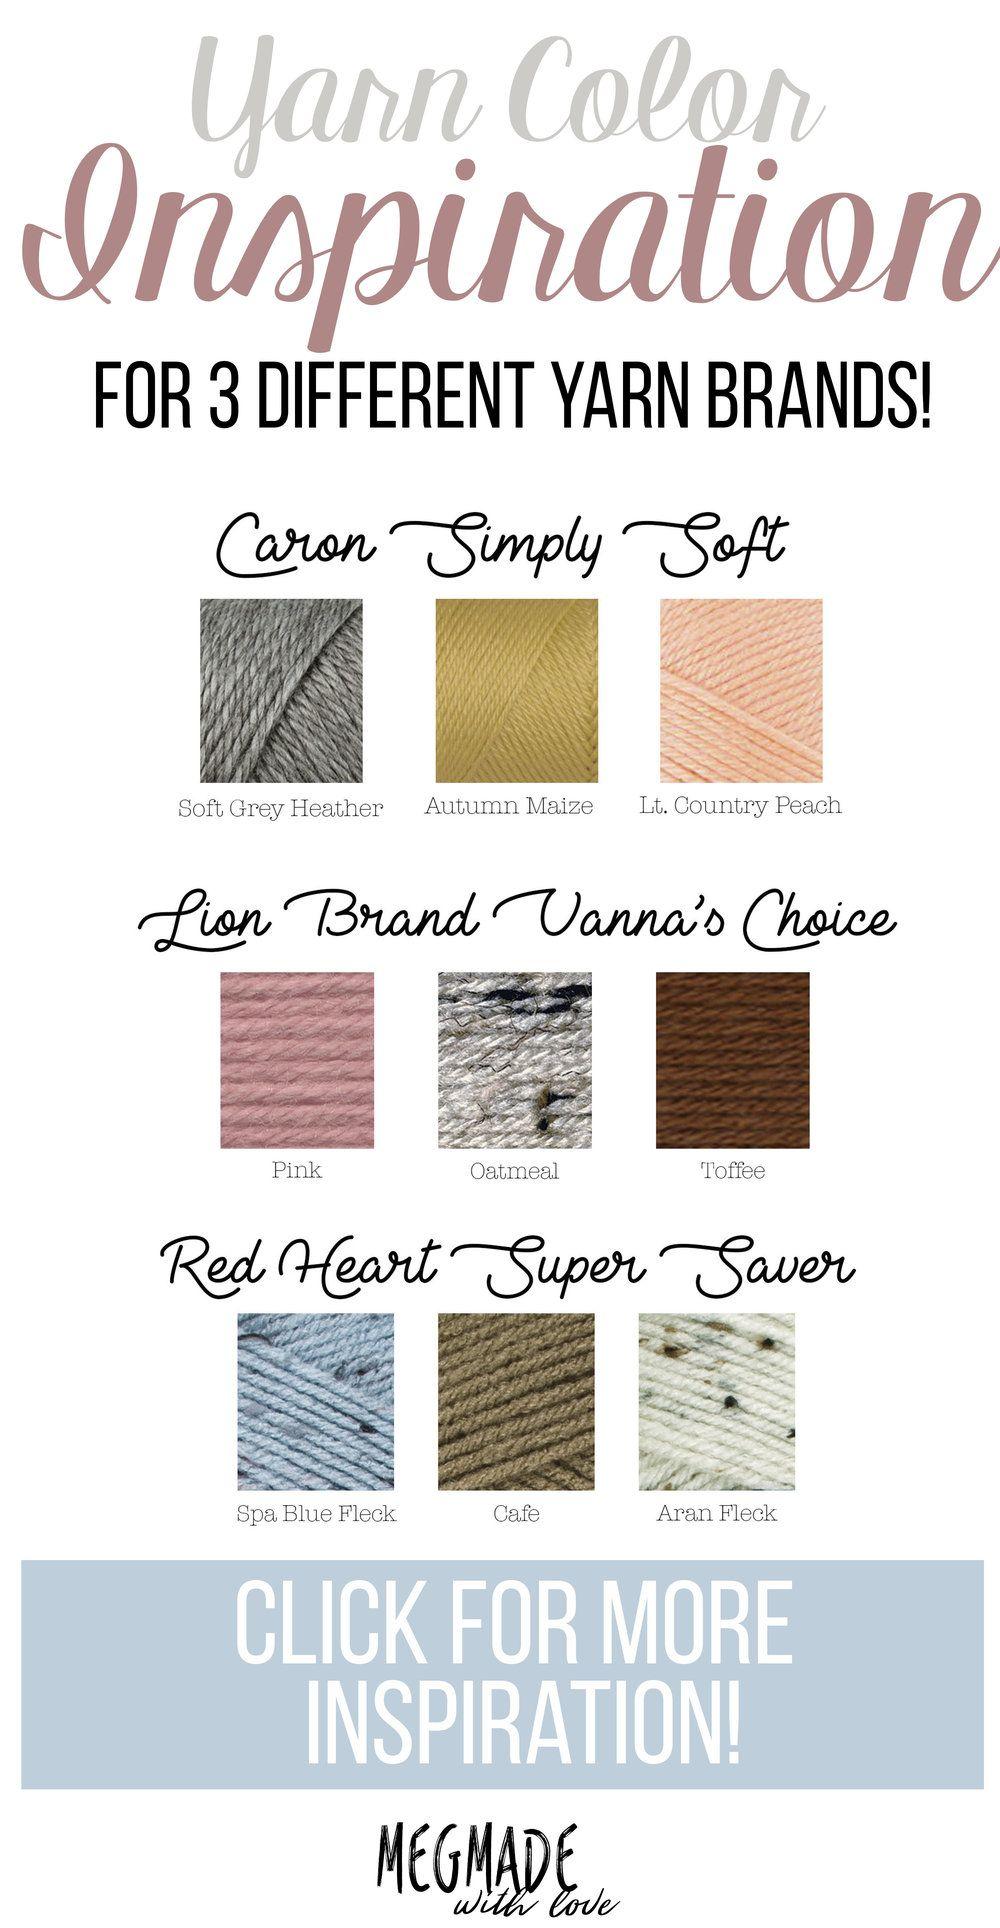 Oh-So-Inspiring Yarn Color Combination Inspiration!